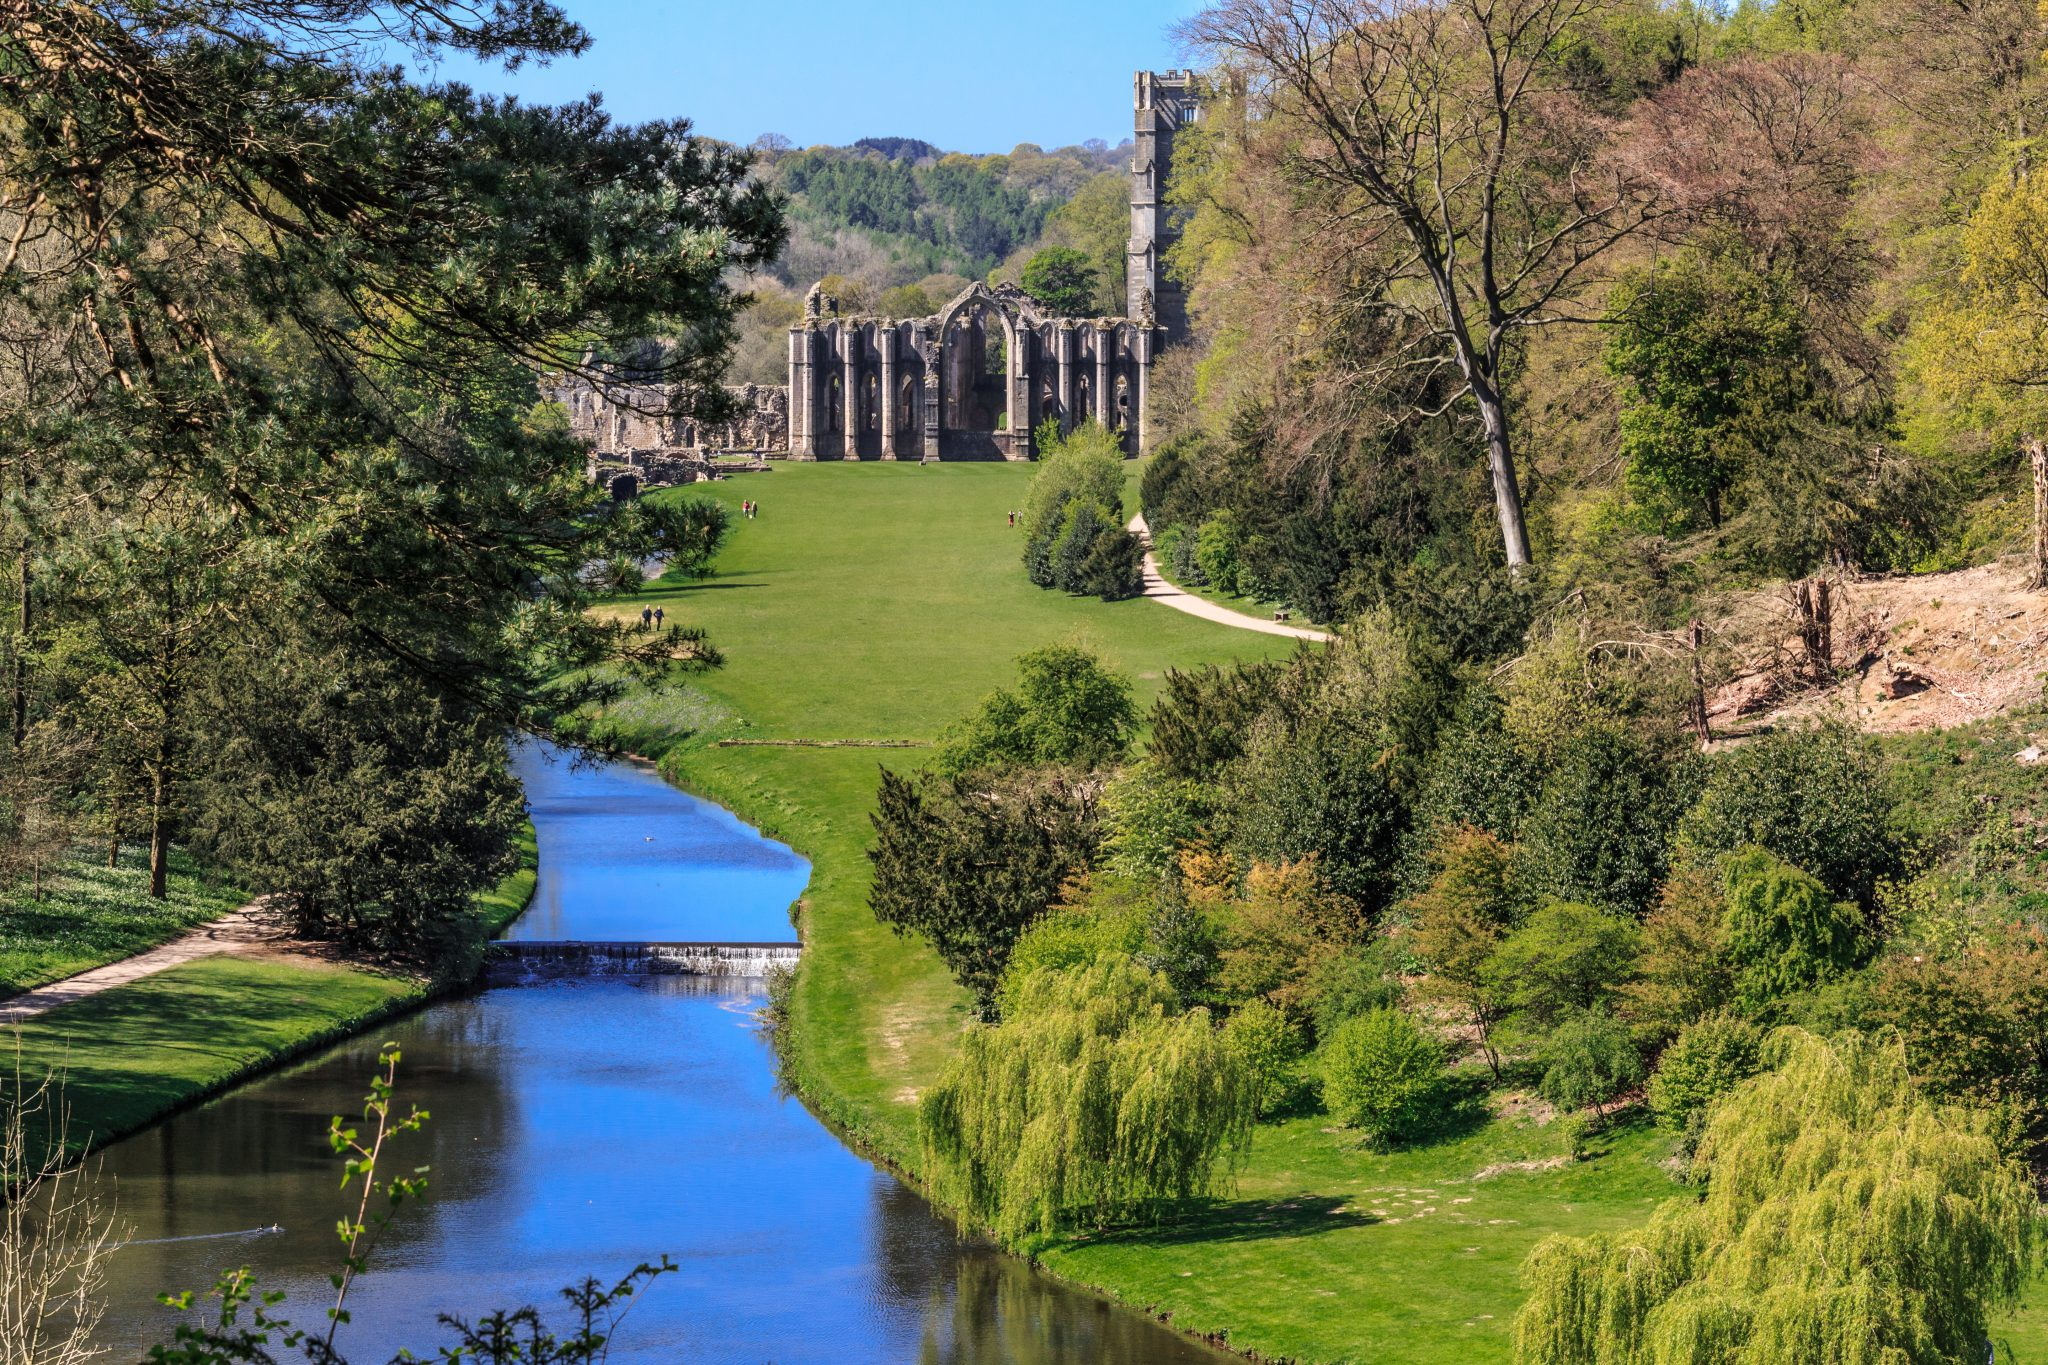 Yorkshire Challenge 23 - 24 July 2022